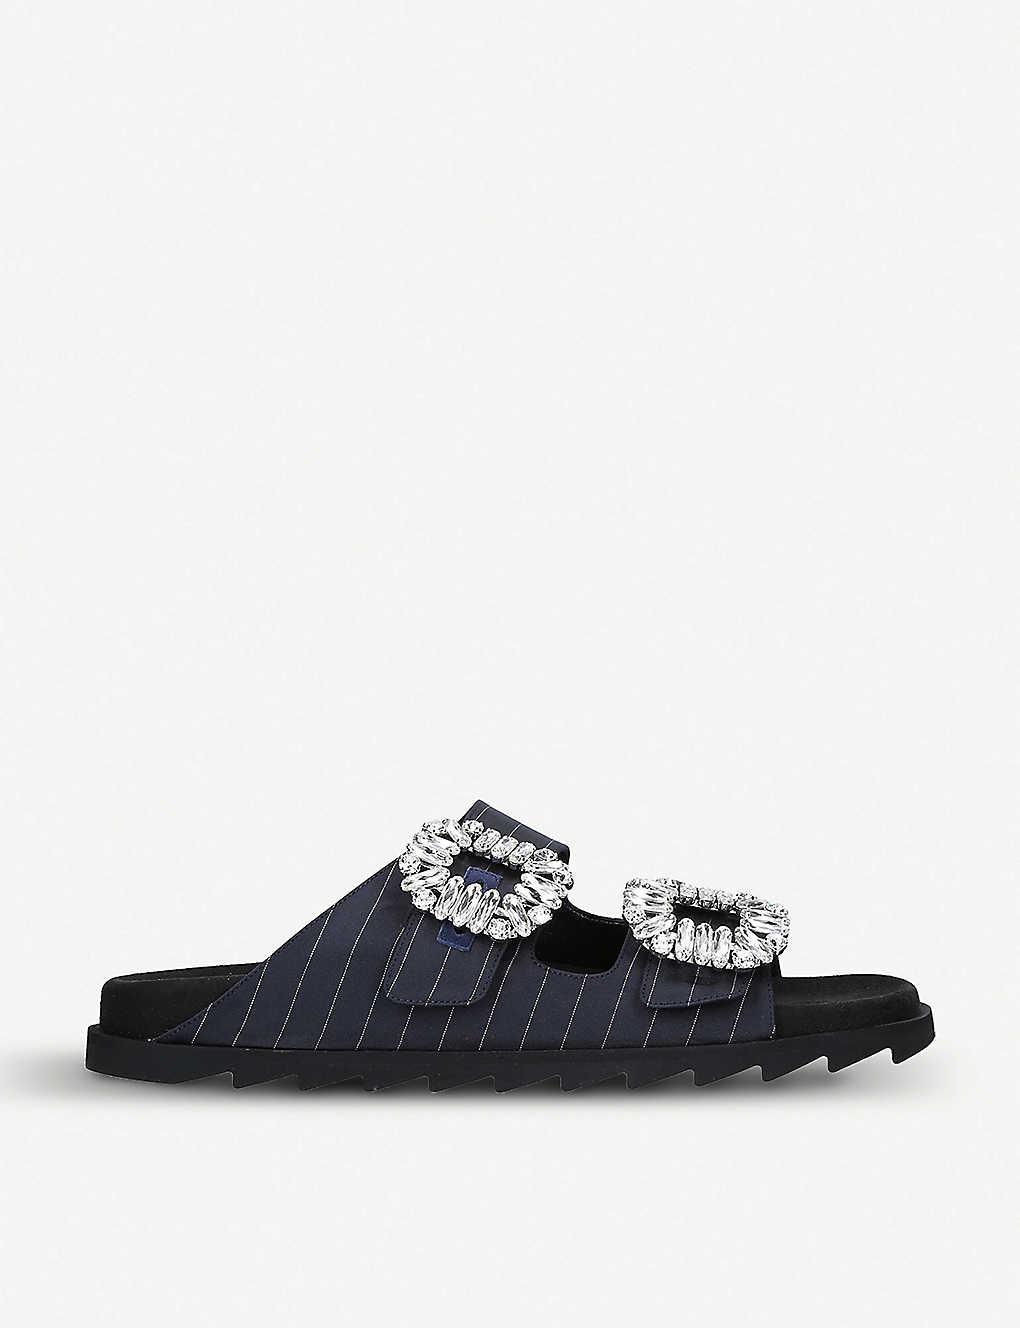 Roger Vivier Slippers Slidy Viv Strass buckle crystal-embellished and striped leather sliders